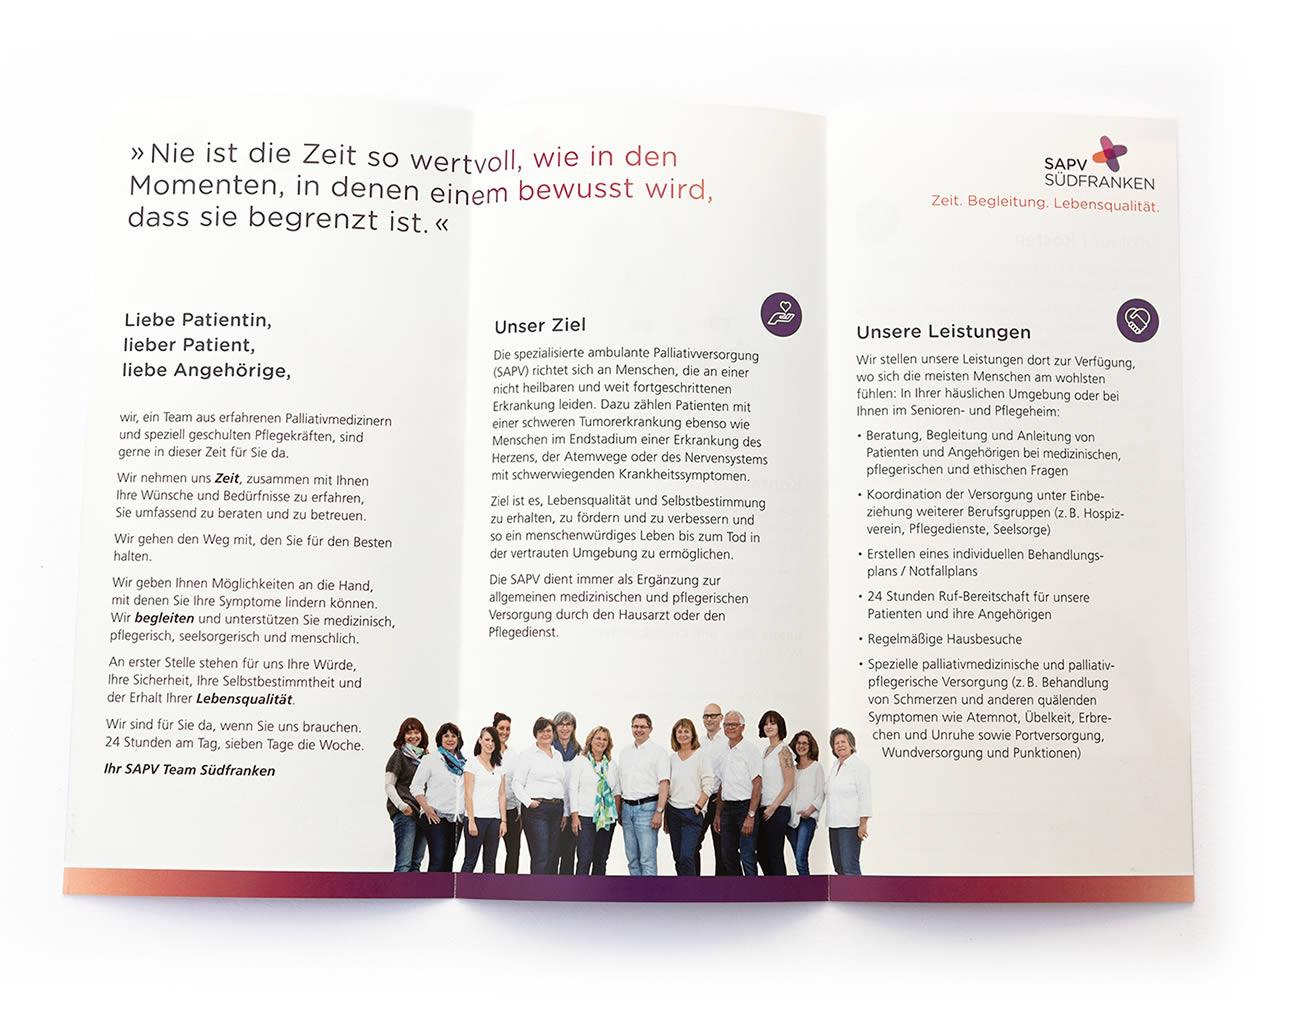 Petra Zimmerer, Büro für Gestaltung, Print, Folder, Sapv Südfranken, Design by pz